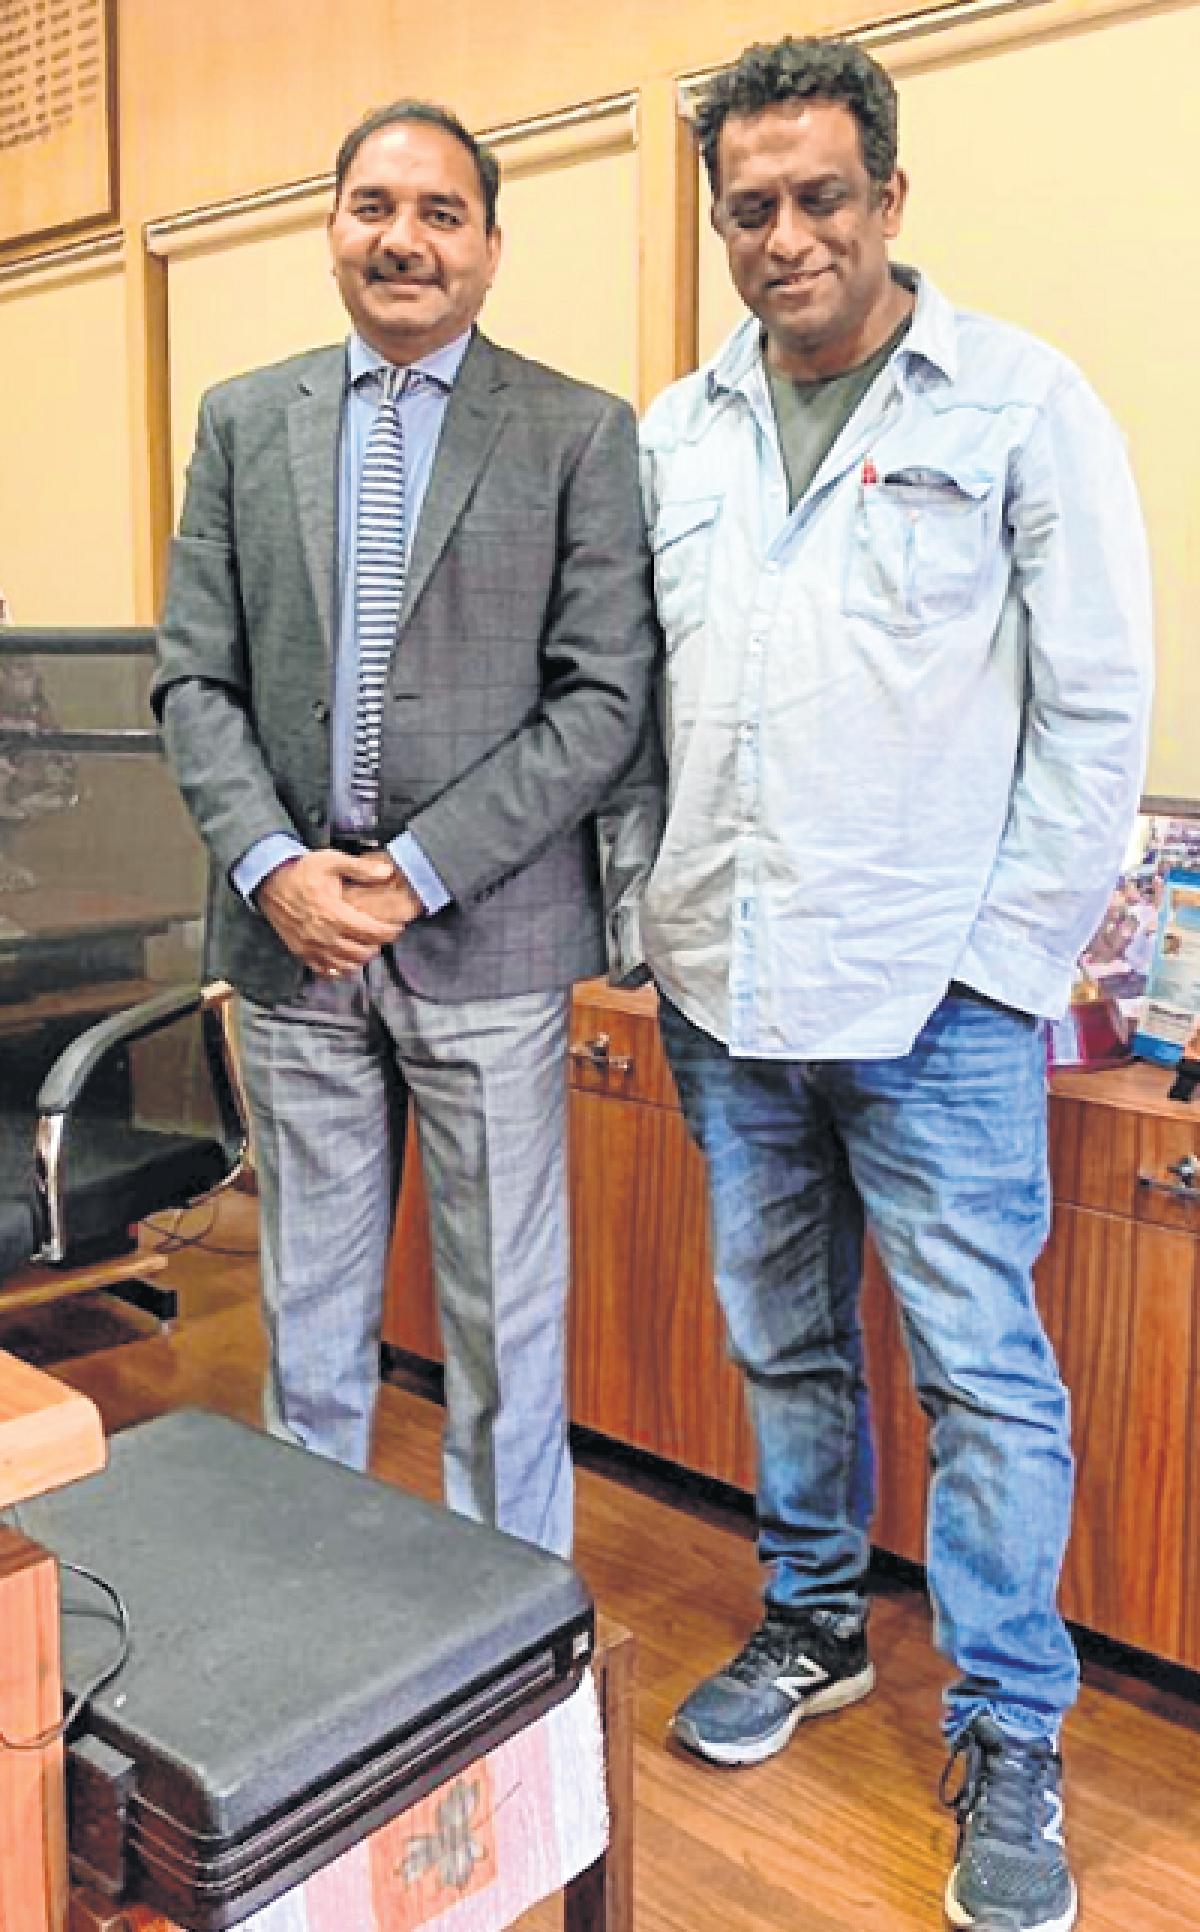 Bhopal: Director Anurag Basu mulling movie over Bhopal serial killer, rape case